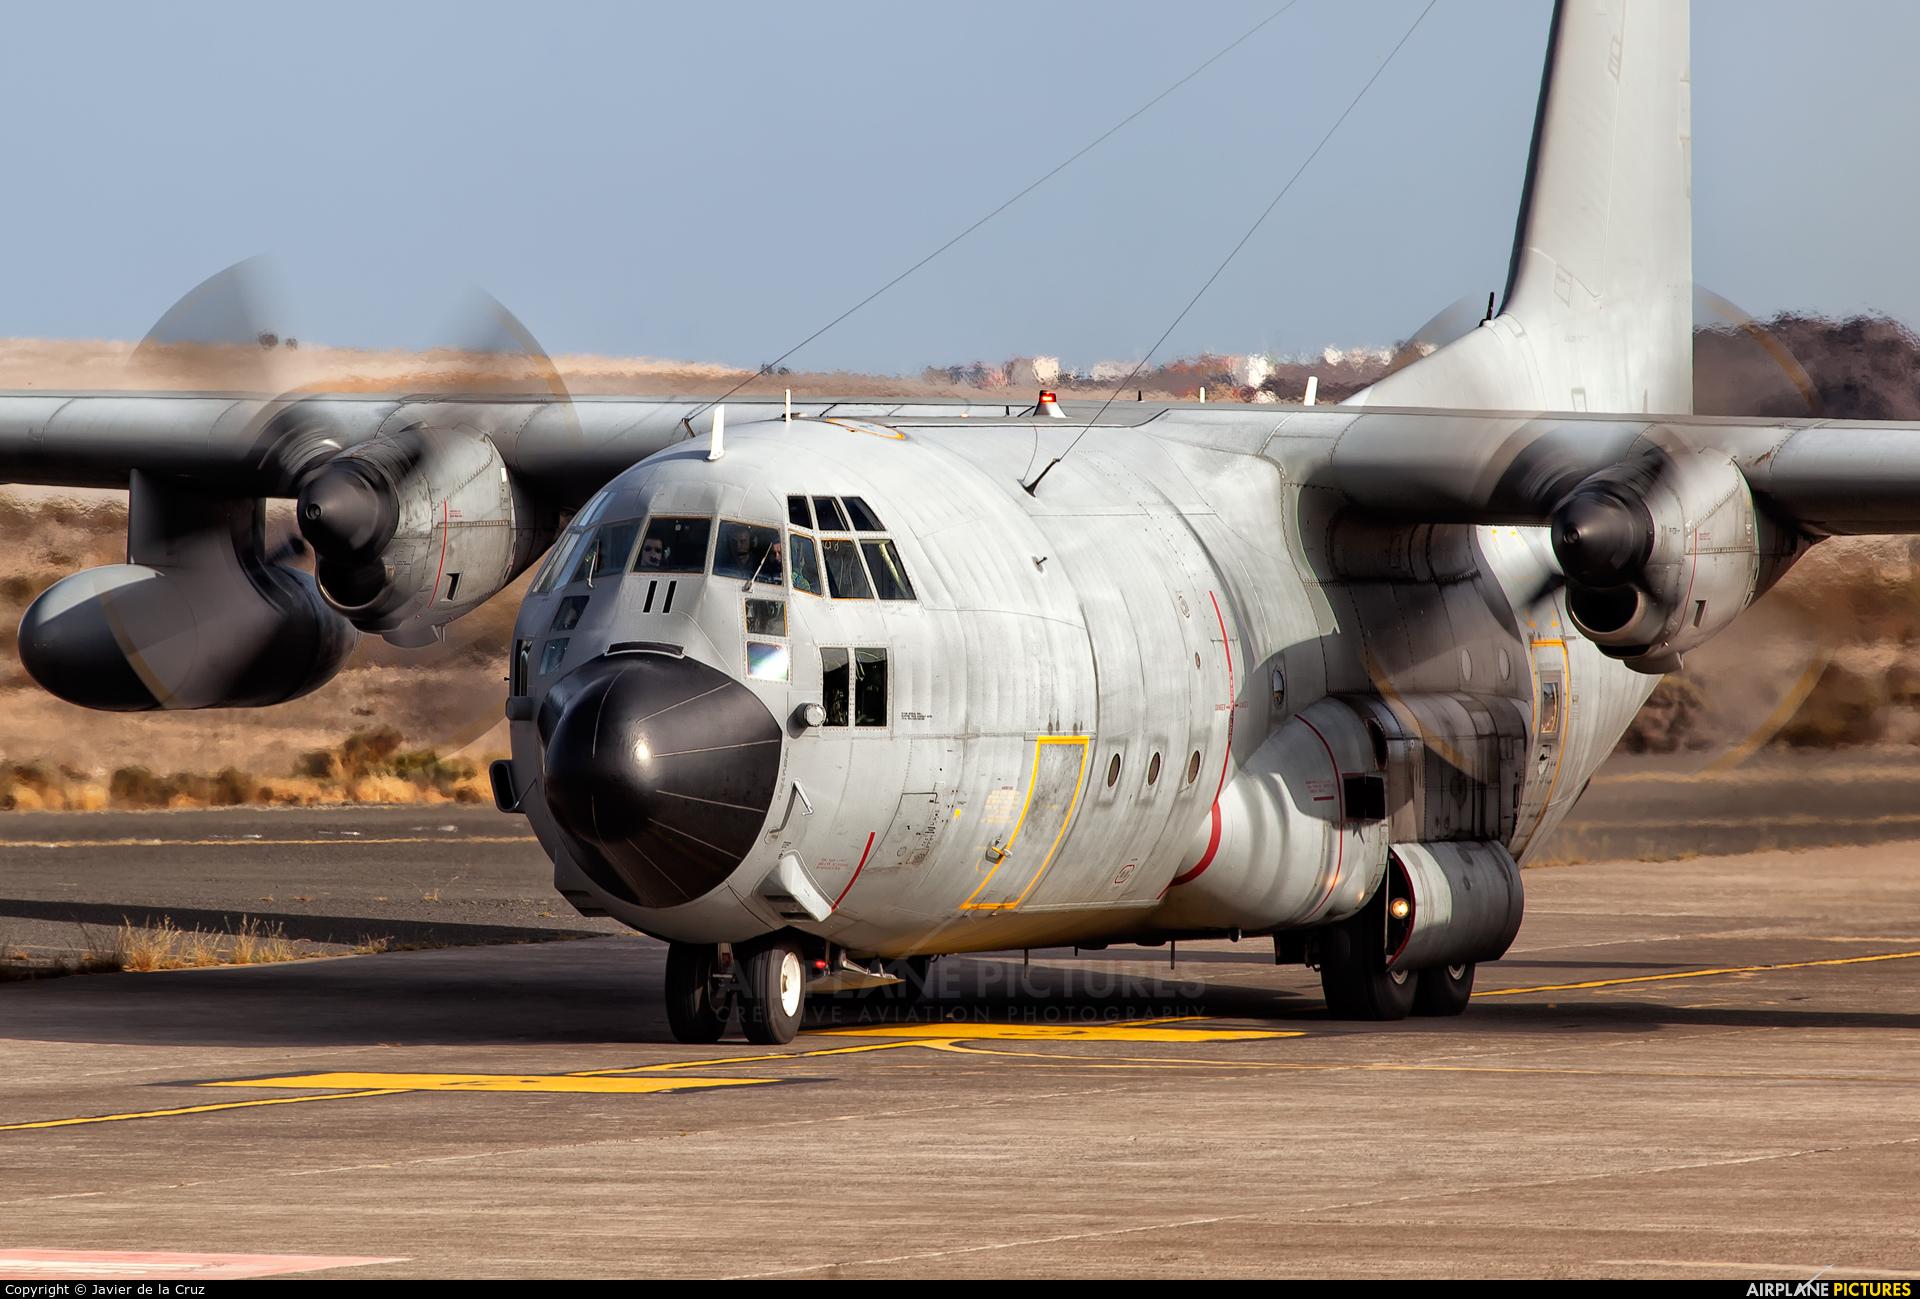 Spain - Air Force TK.10-11 aircraft at Aeropuerto de Gran Canaria